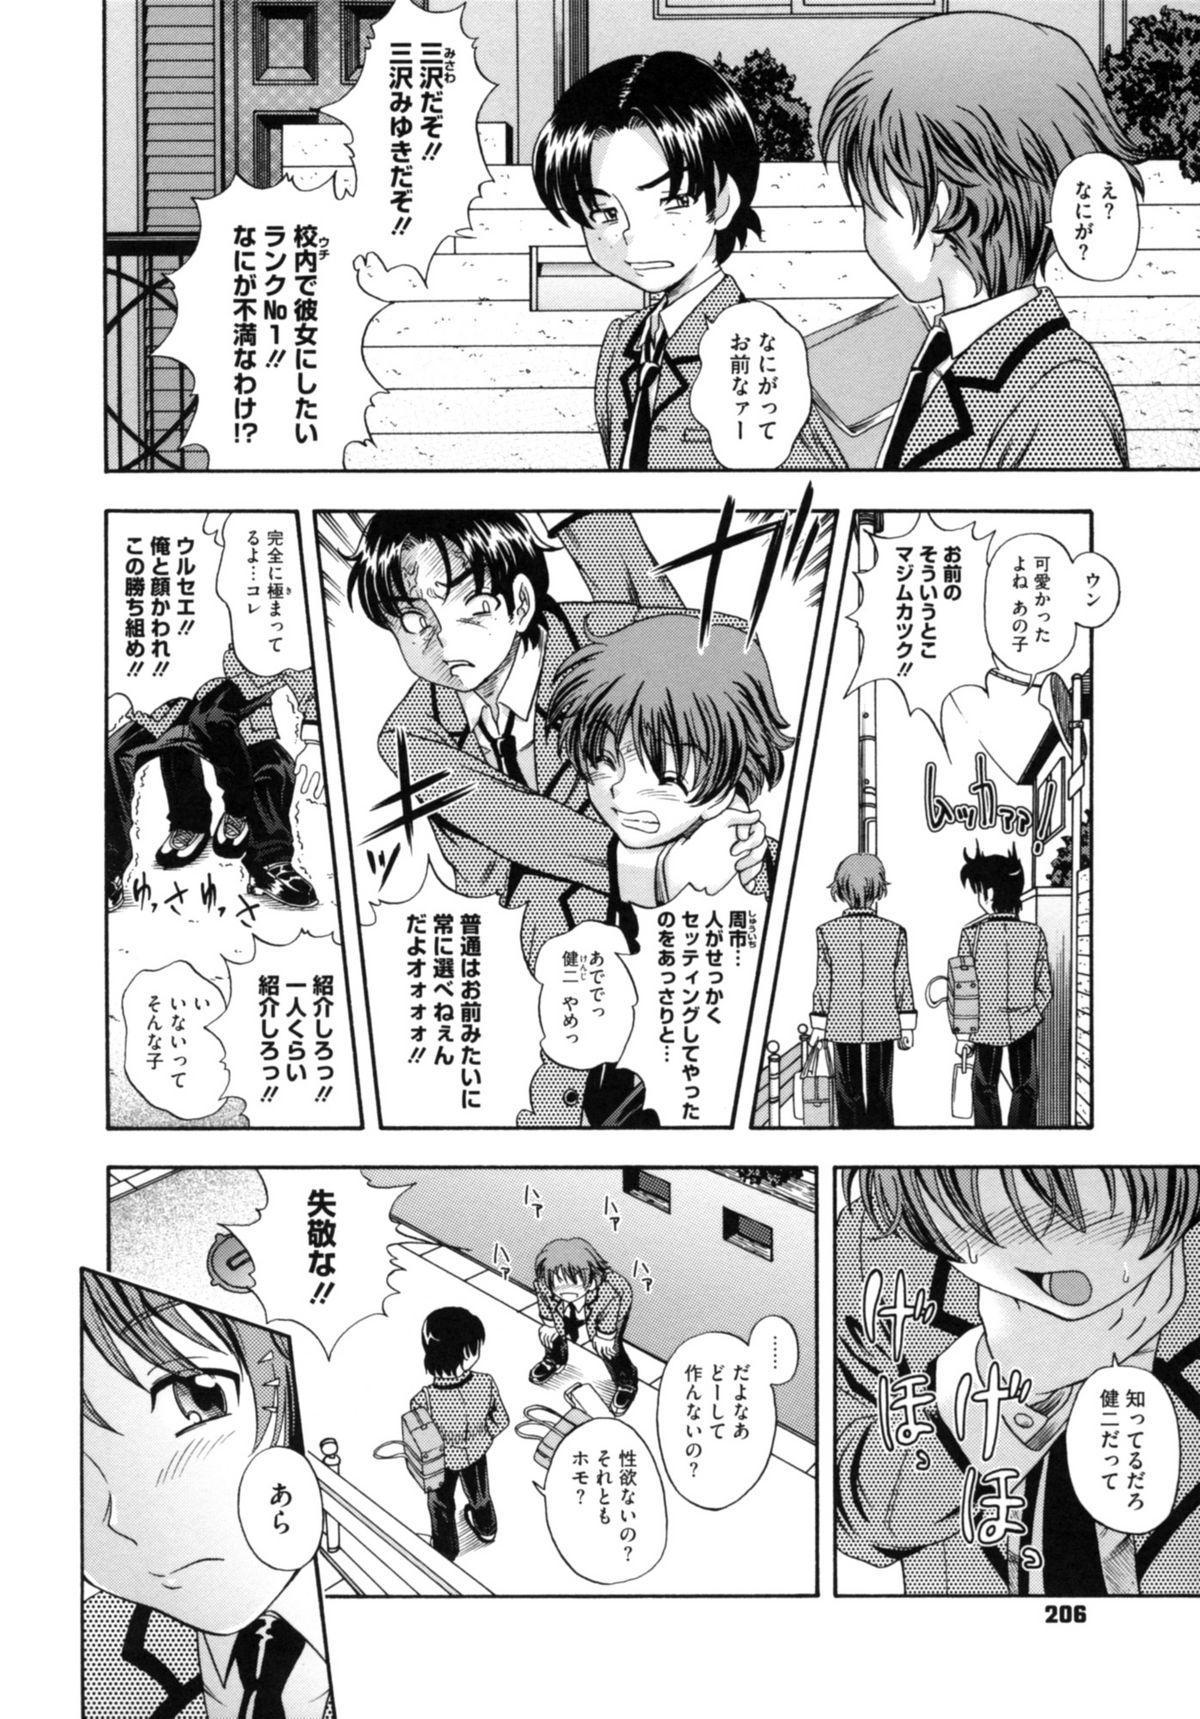 Soushisouai Note Nisatsume 215